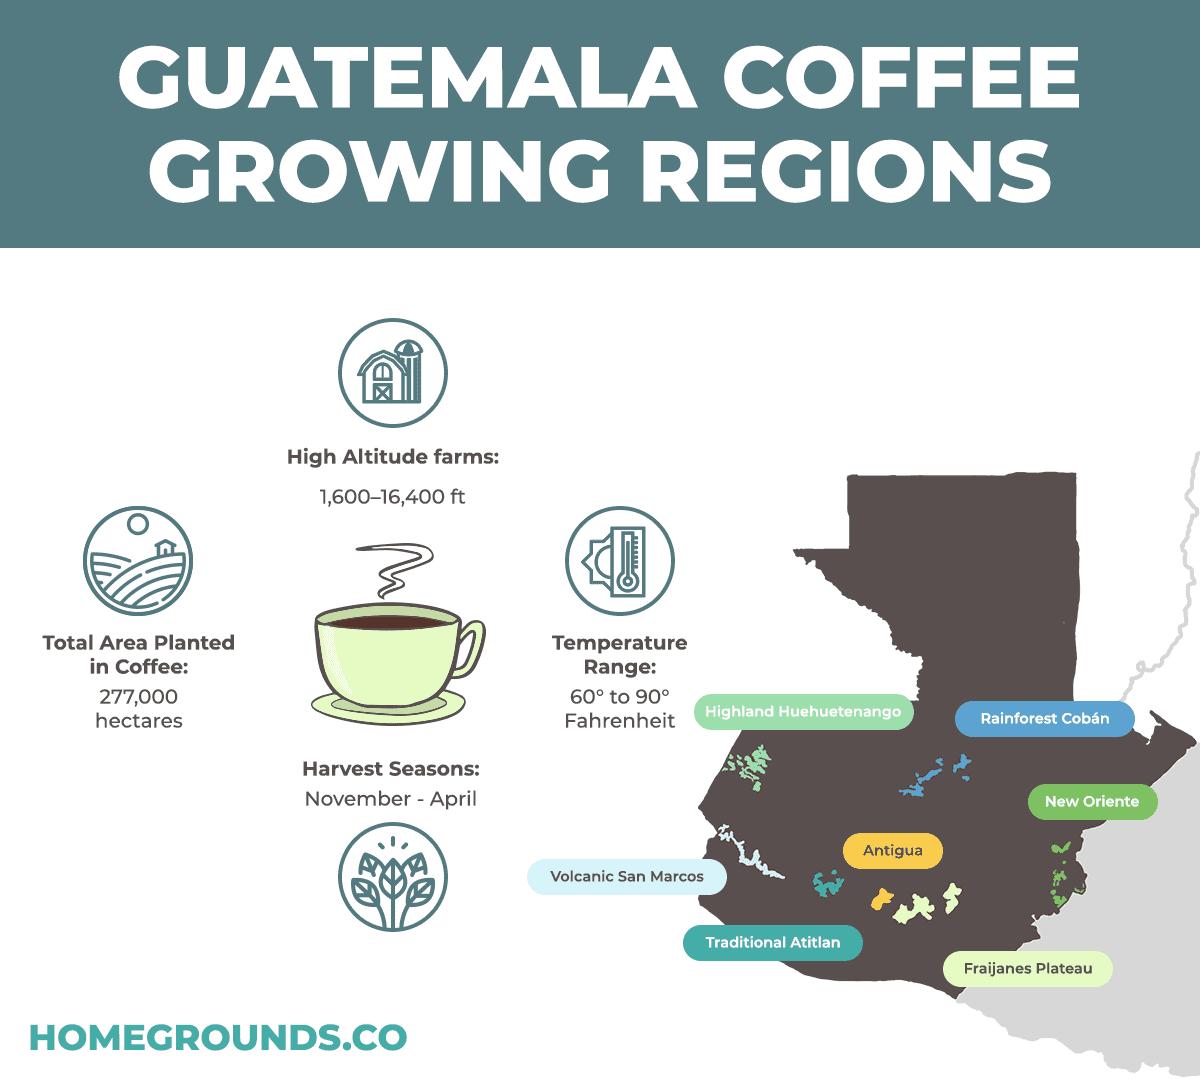 Anacafe Guatemalan Coffee Regions